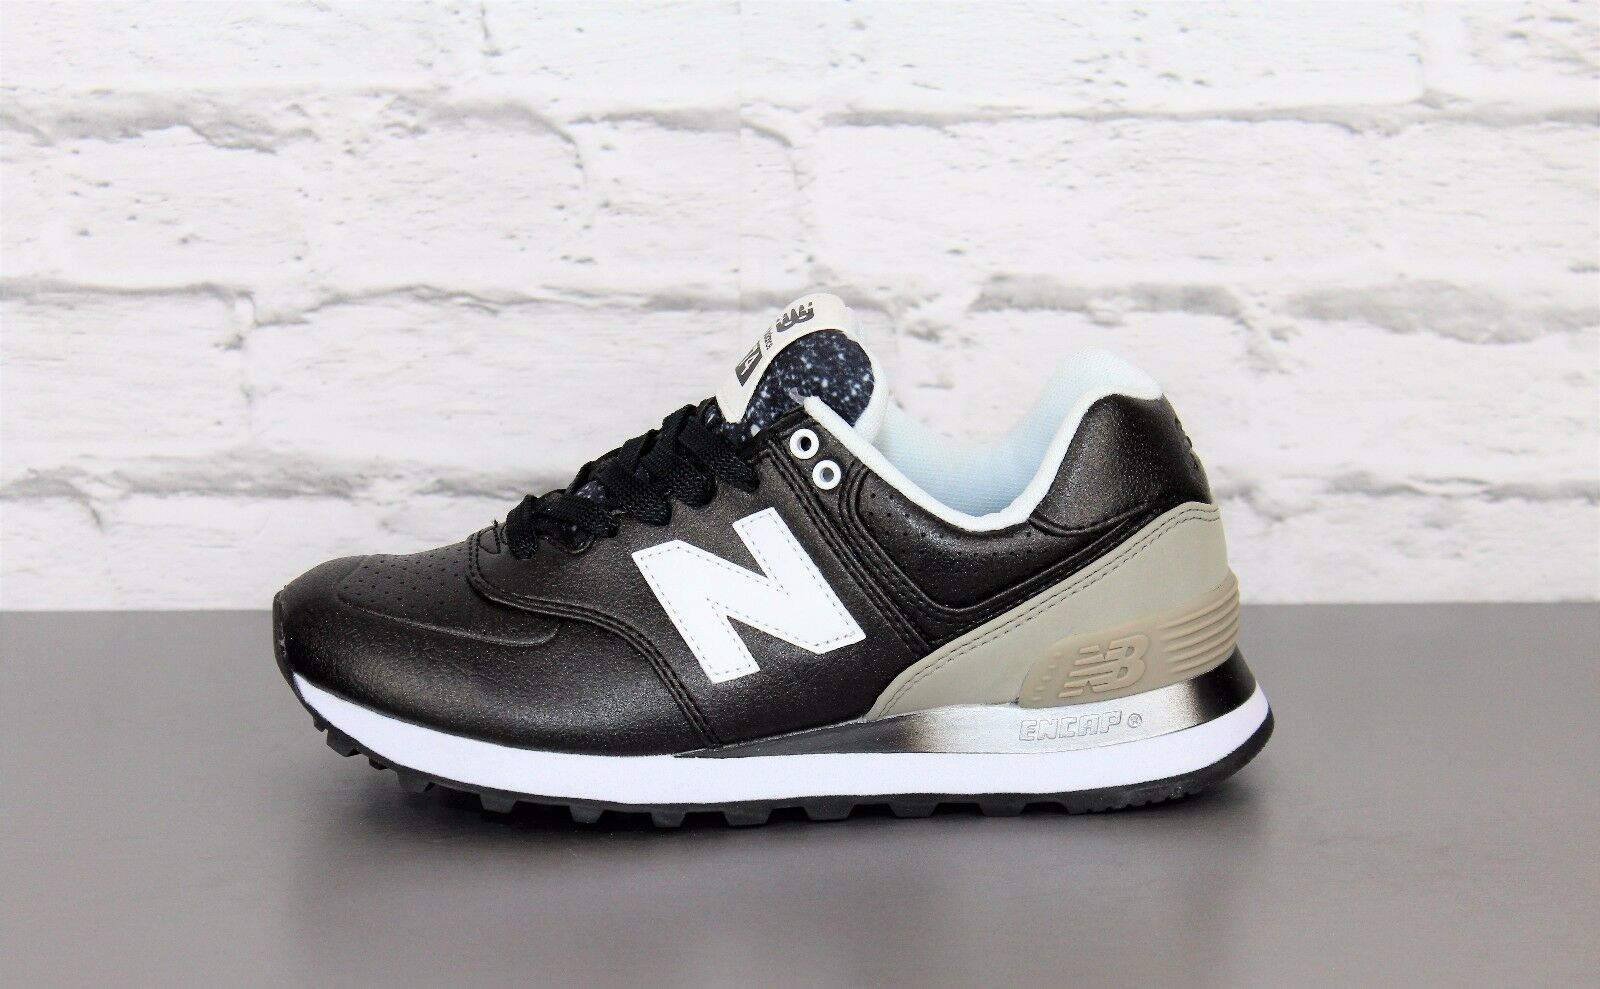 Zapatos señora new balance wl574raa negro cortos zapatillas zapato bajo zapatos